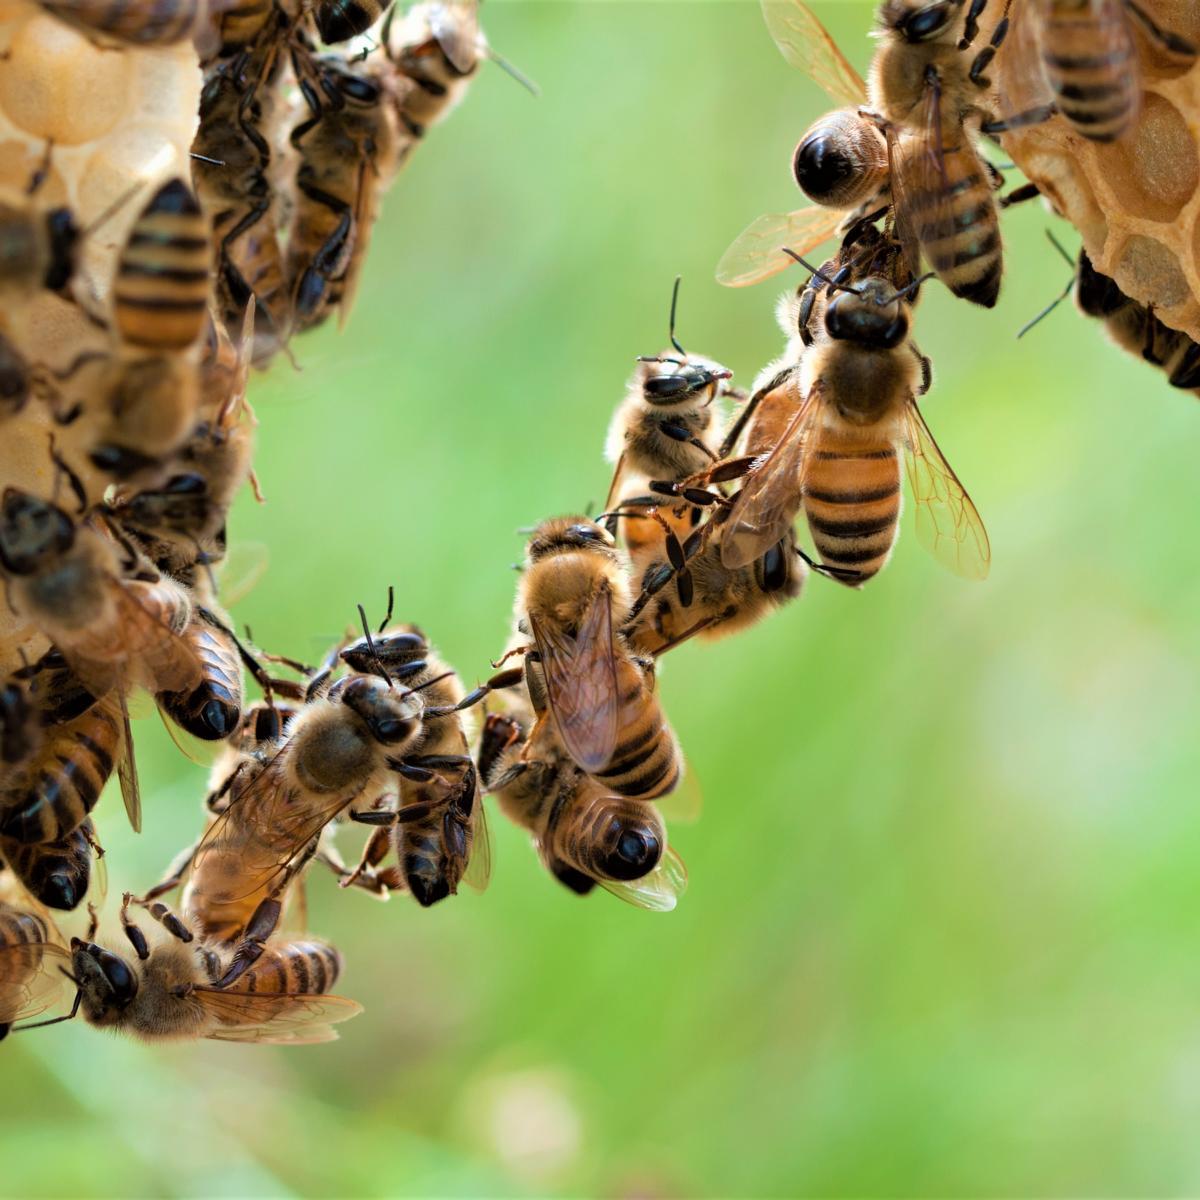 Style Hannover Die Bienenhuette 6 - Die Bienenhütte - Wesensgemäße Bienenhaltung